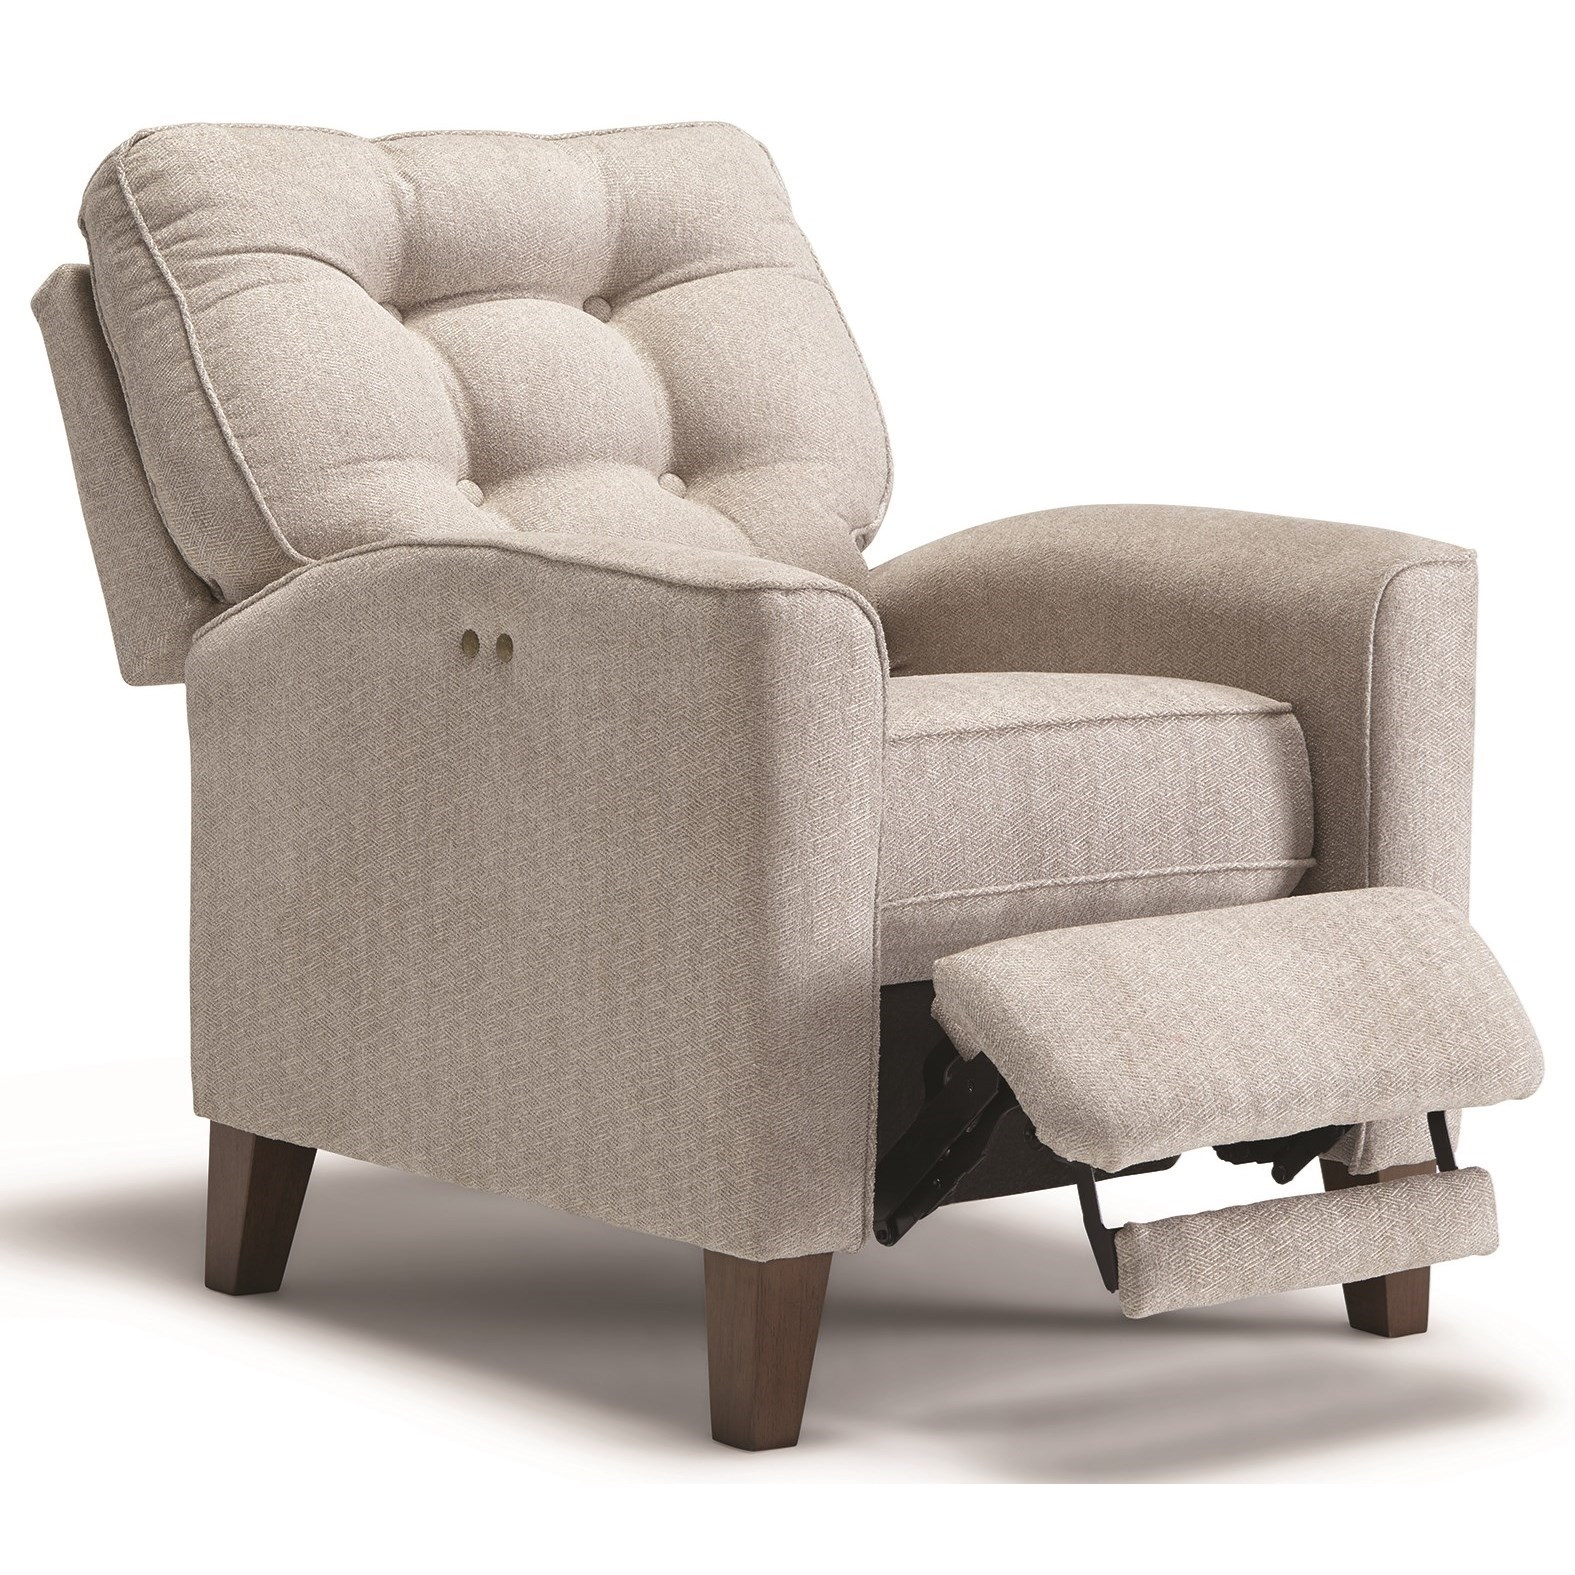 Best Home Furnishings Karinta Power High Leg Recliner With